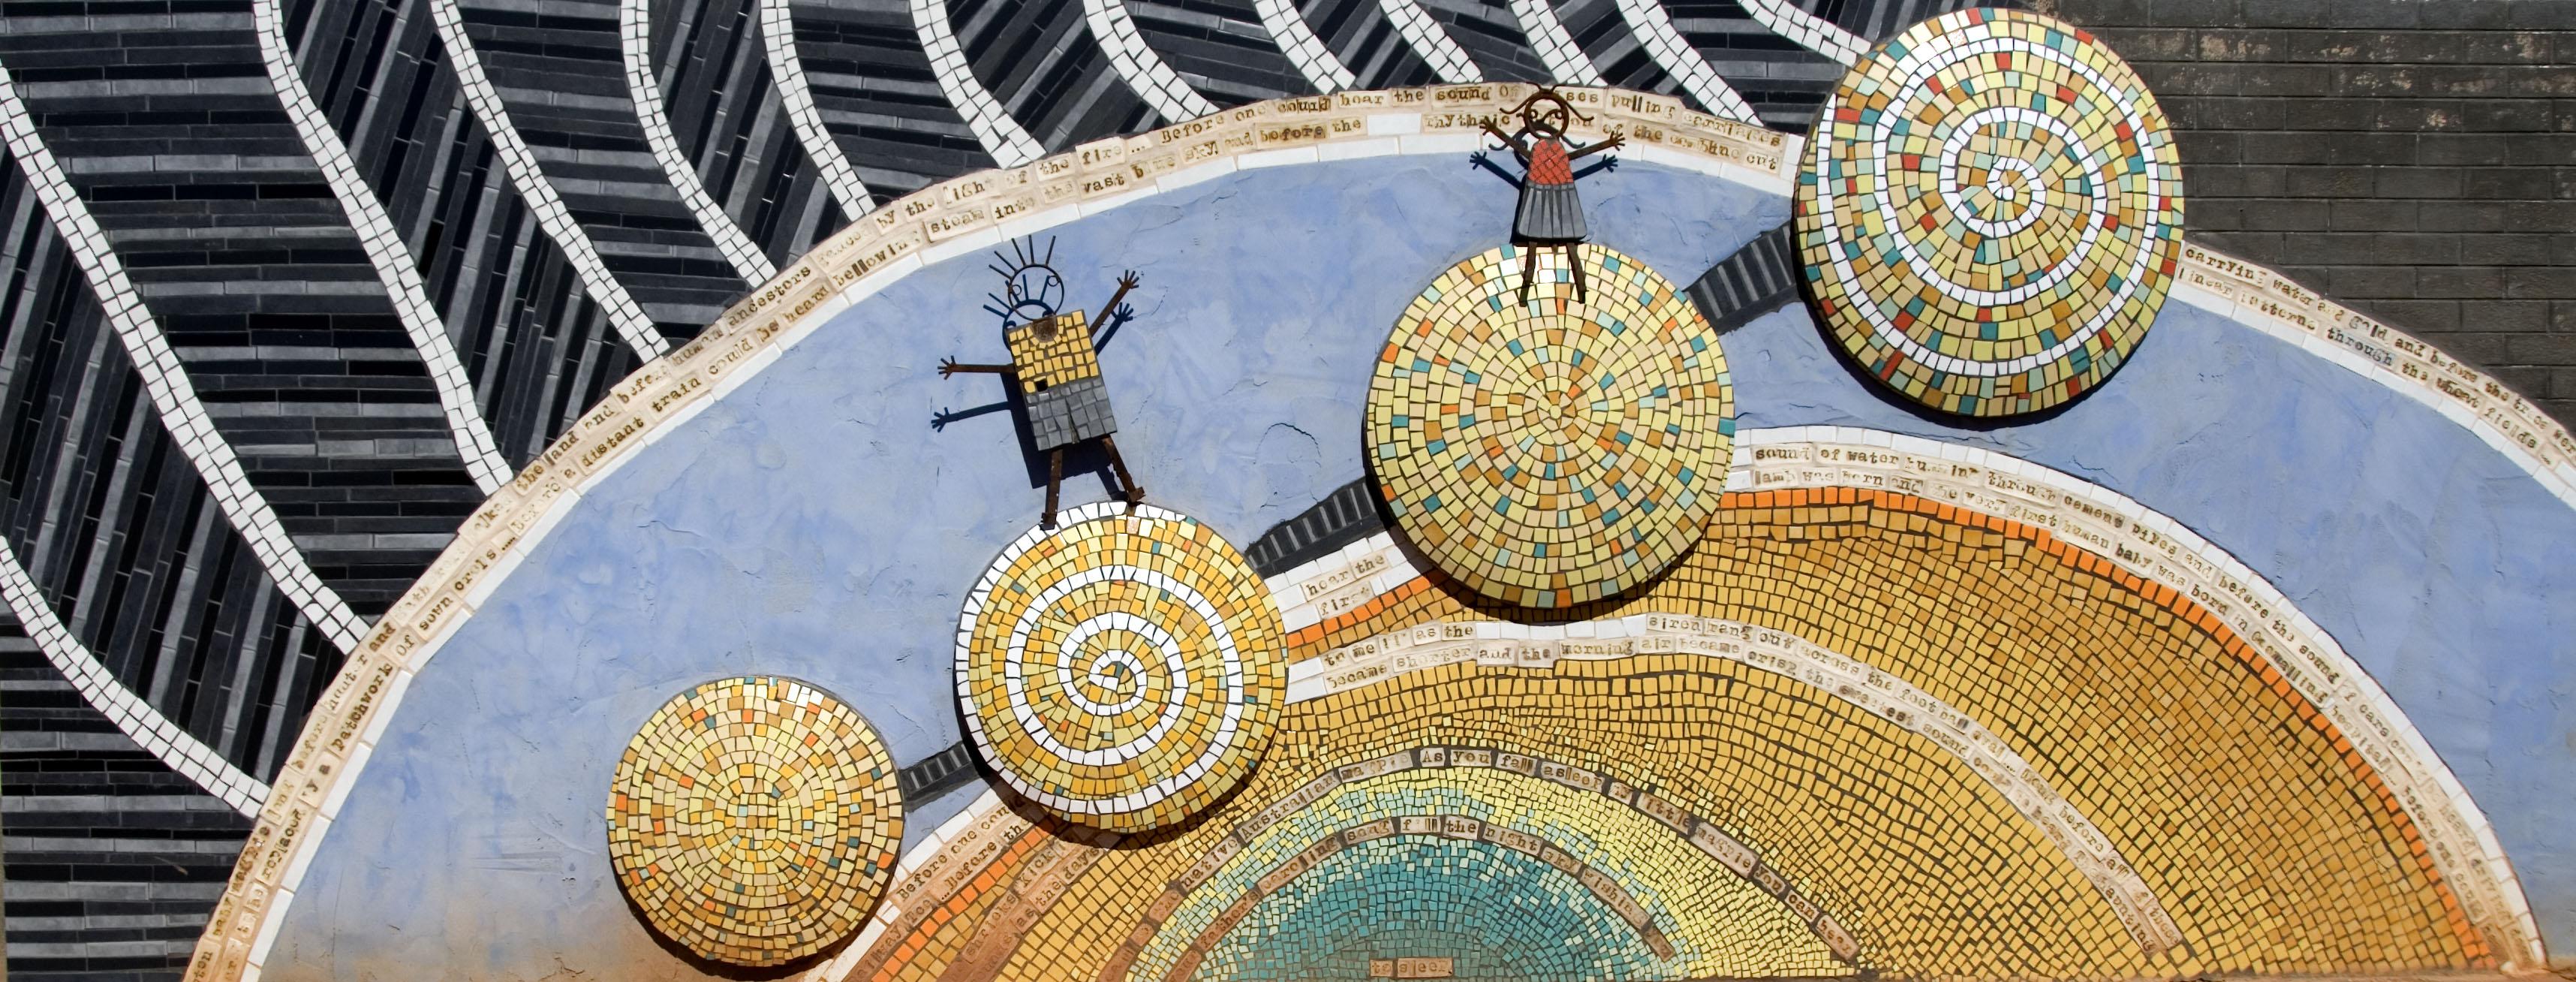 Mosaic at Goomalling Primary School, Western Australia